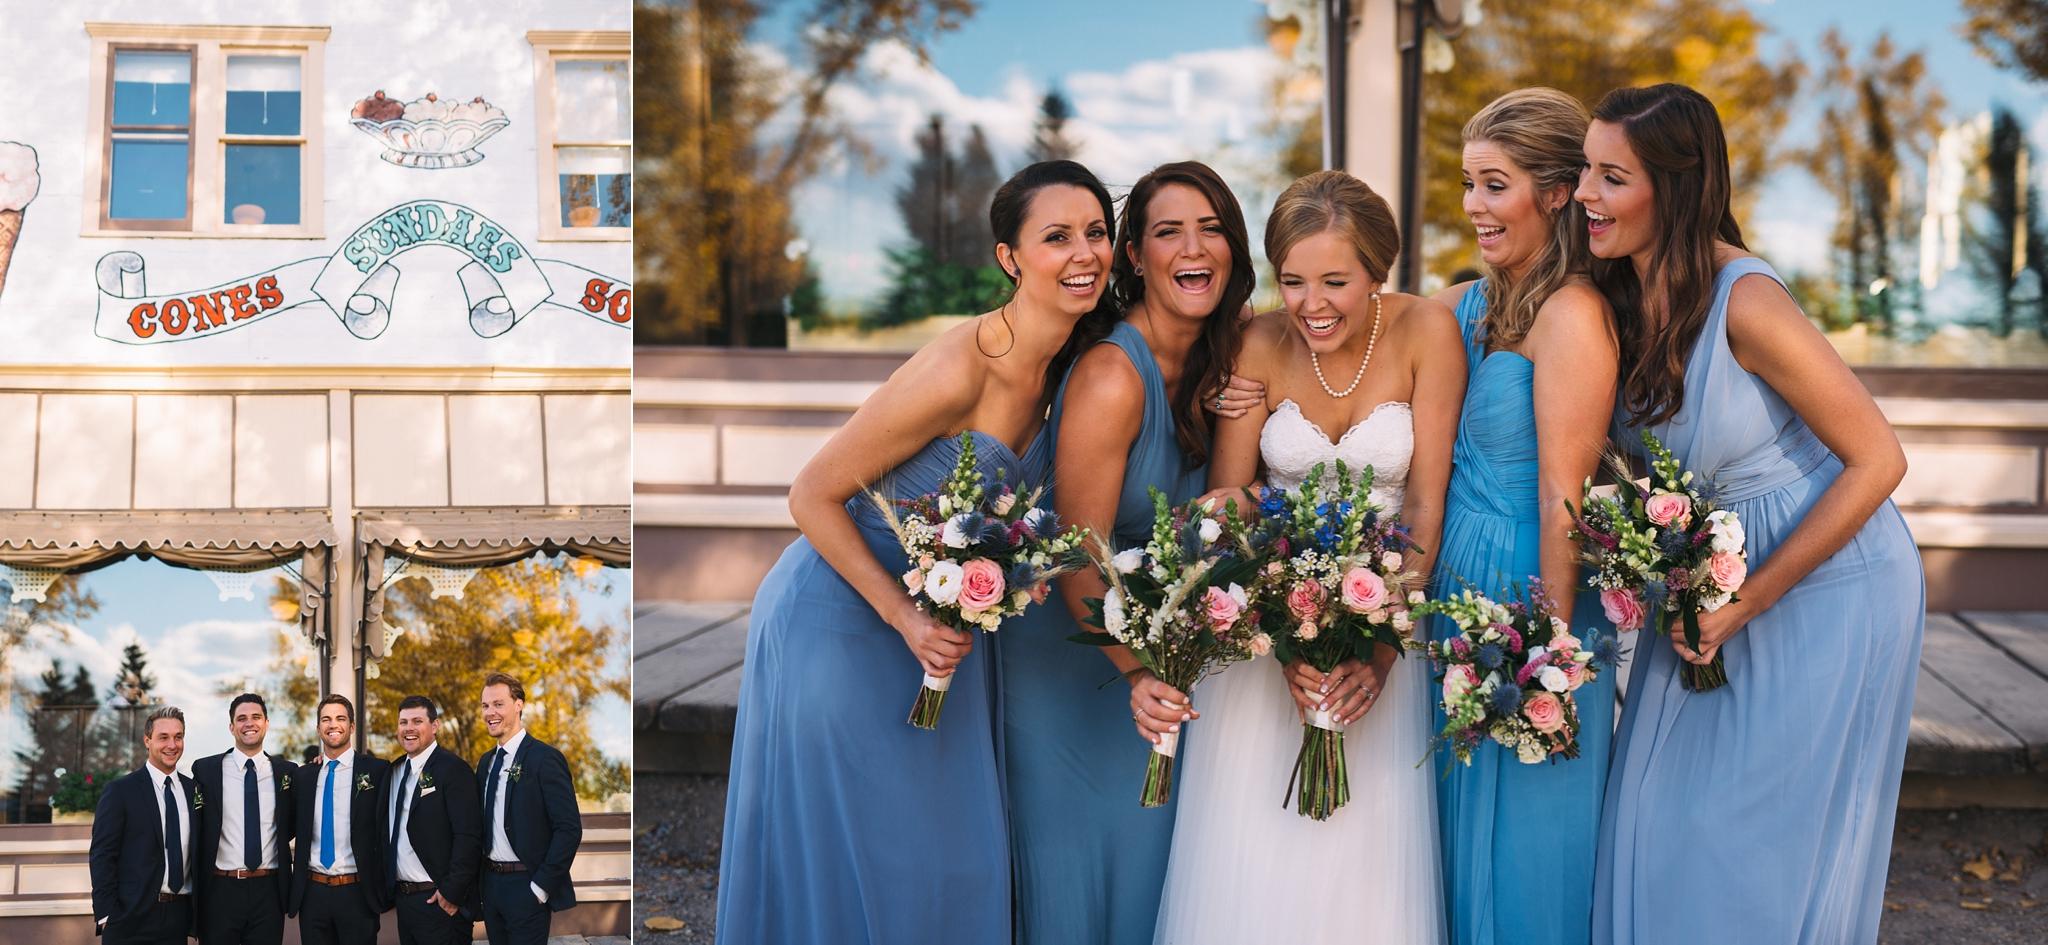 kaihla_tonai_intimate_wedding_elopement_photographer_2890